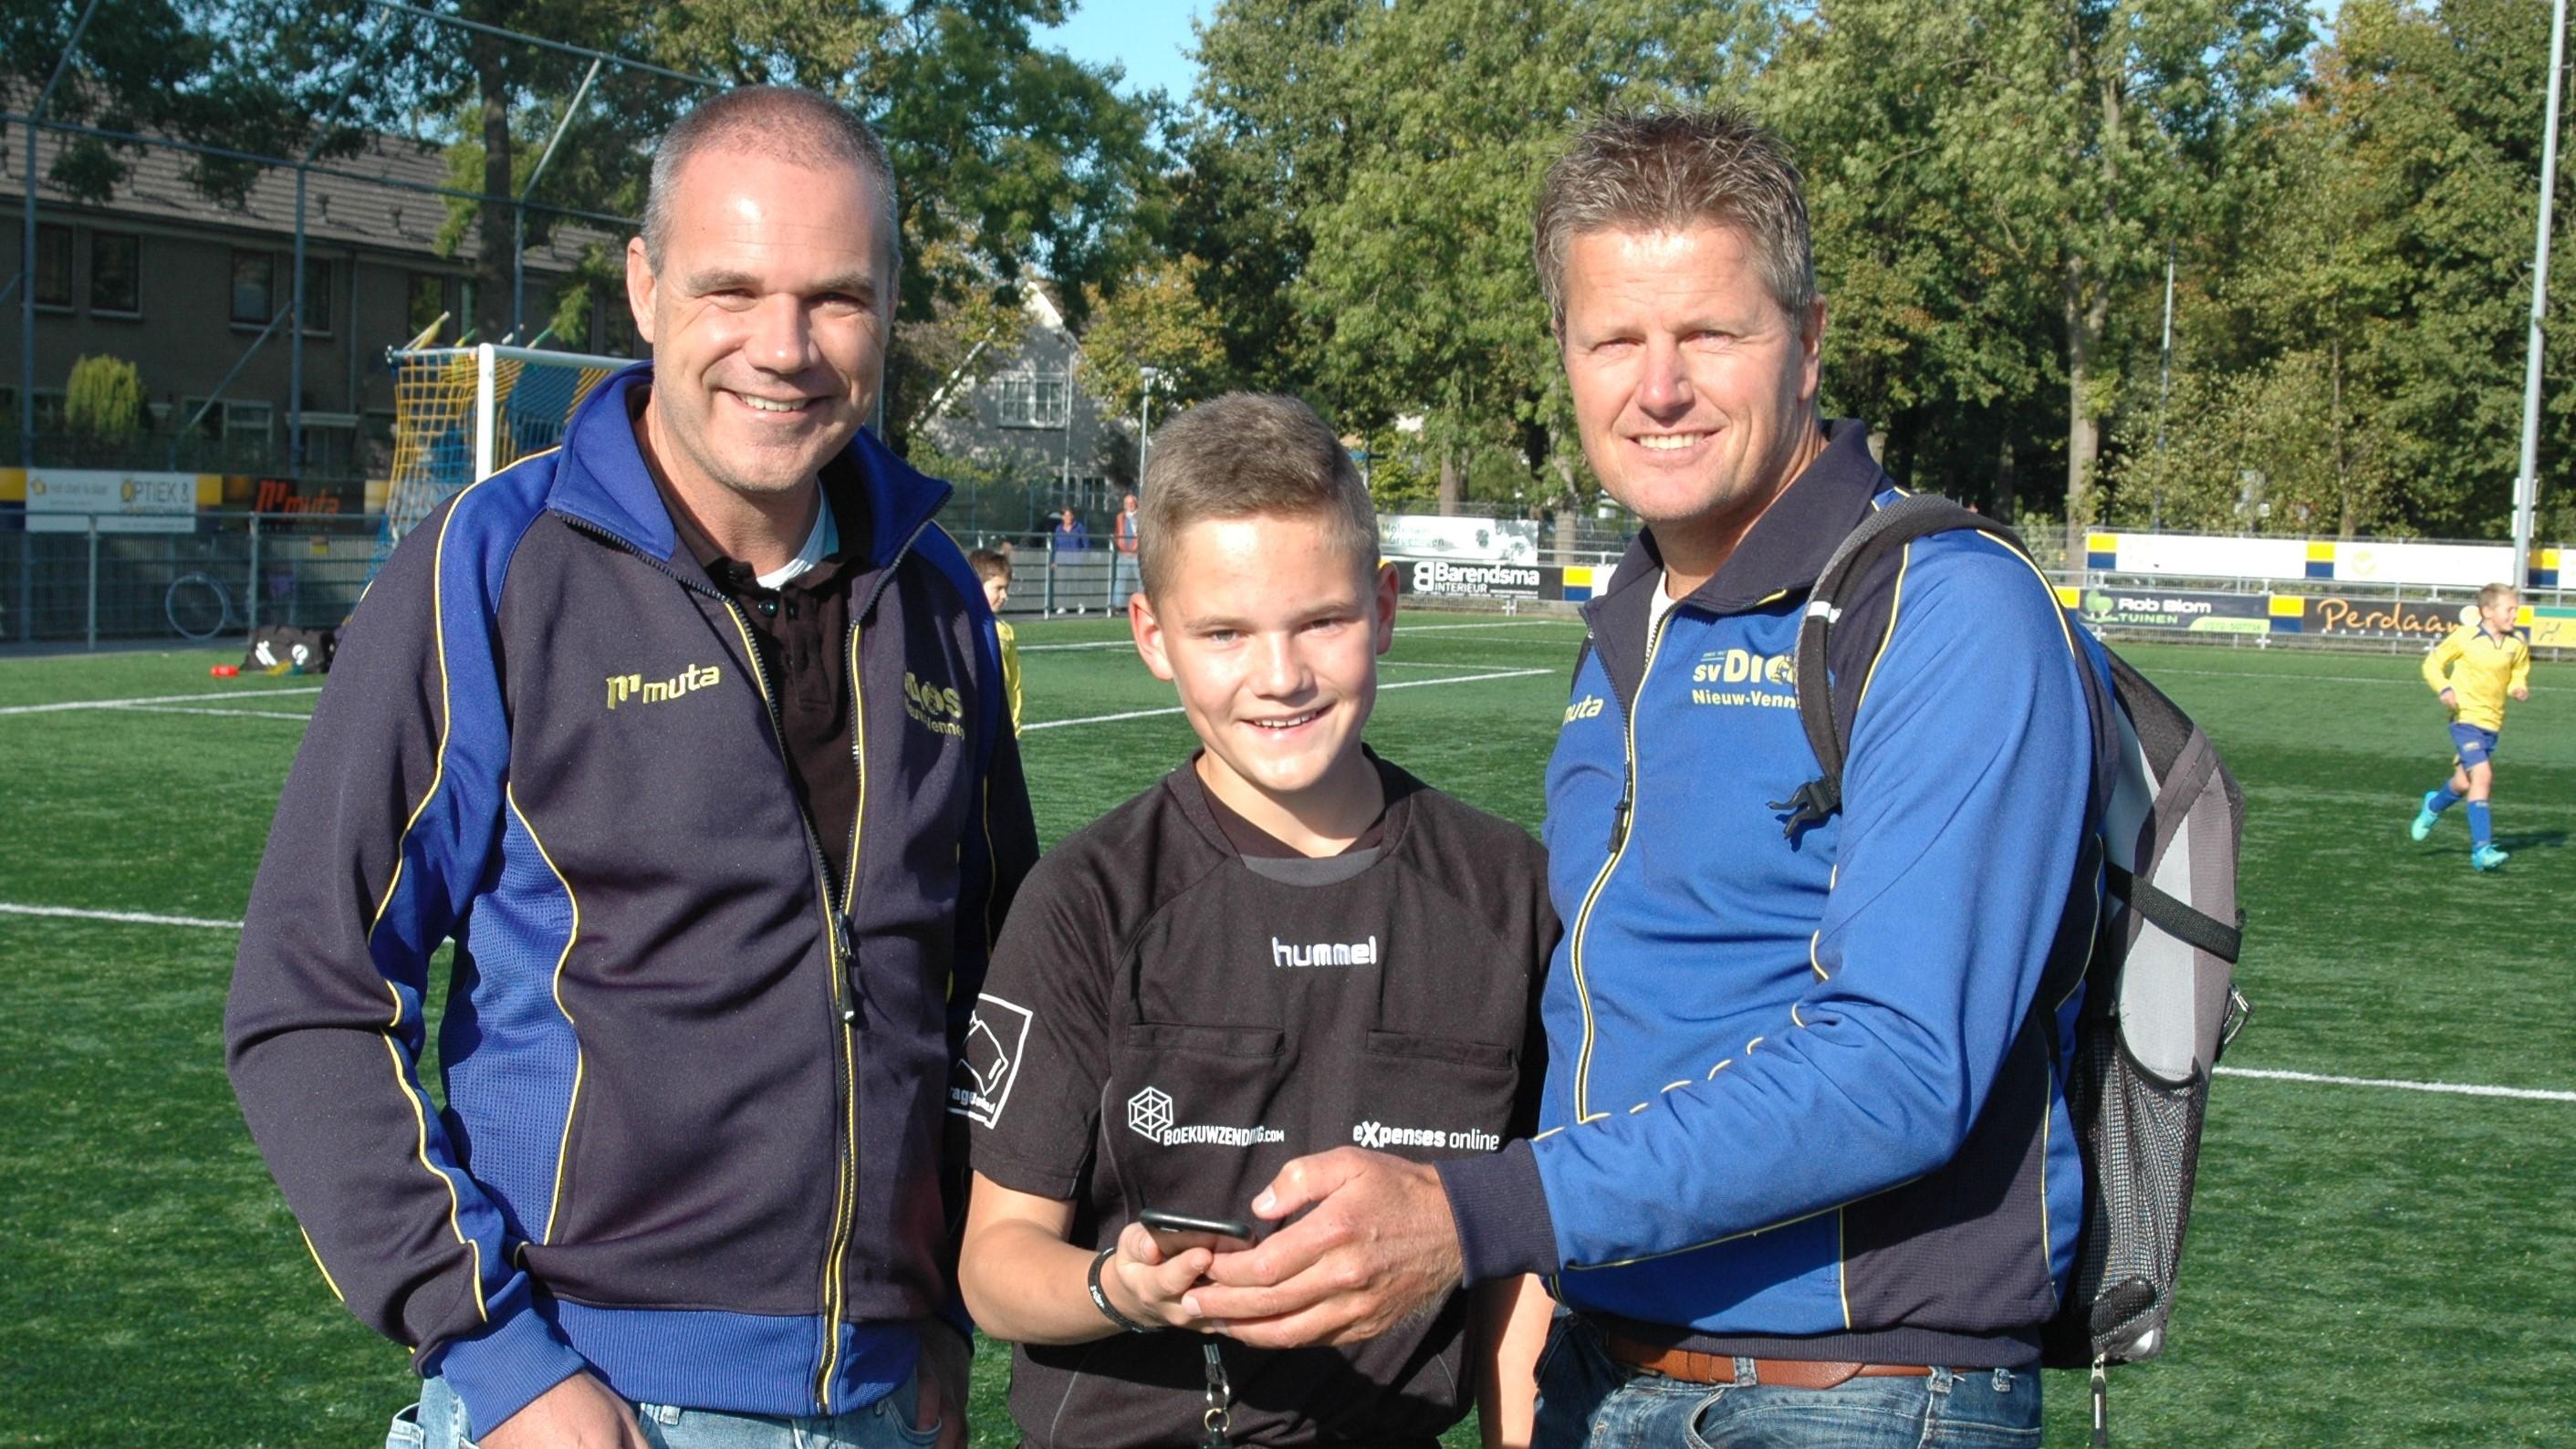 Arbitrage Online - Voetbal in Haarlem